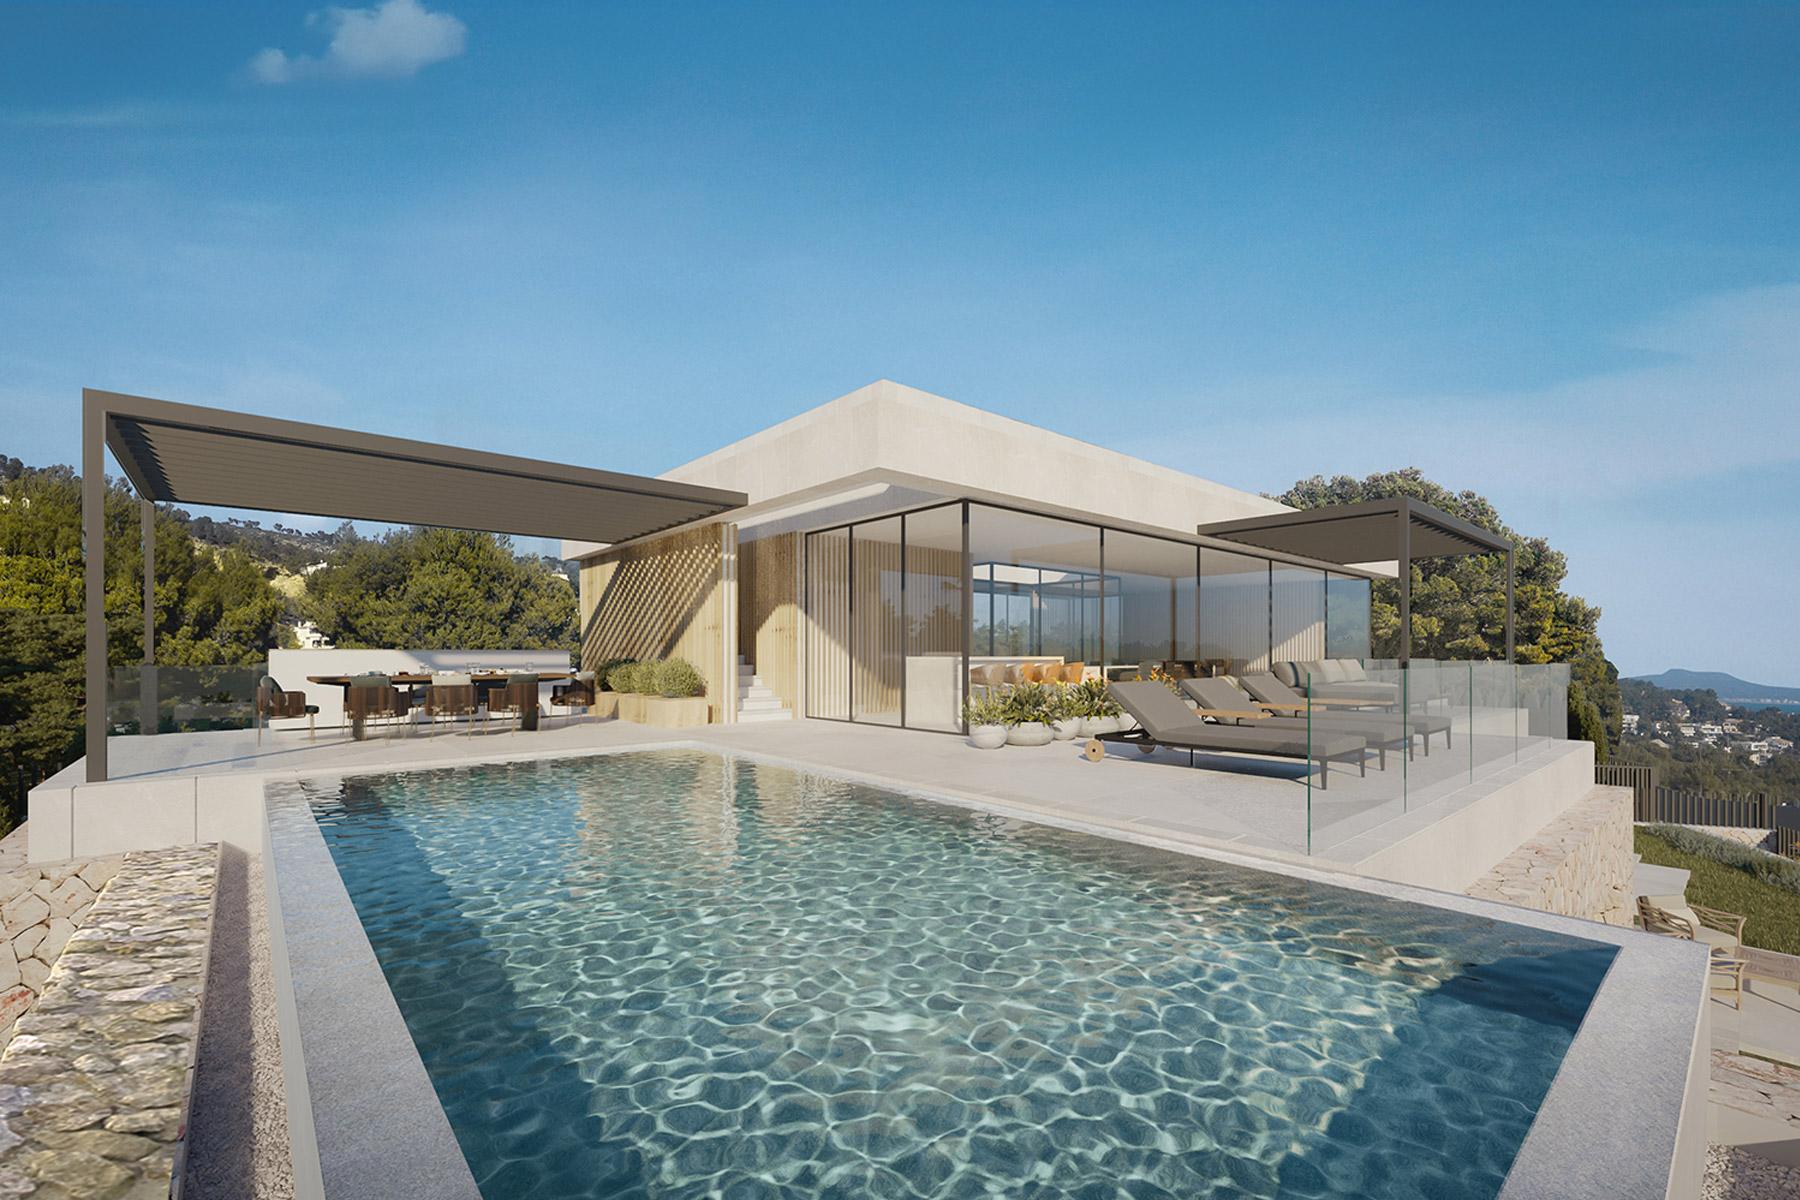 Neubauvilla mit Infinitypool, Meerblick und 4 Schlafzimmern in Costa d'en Blanes